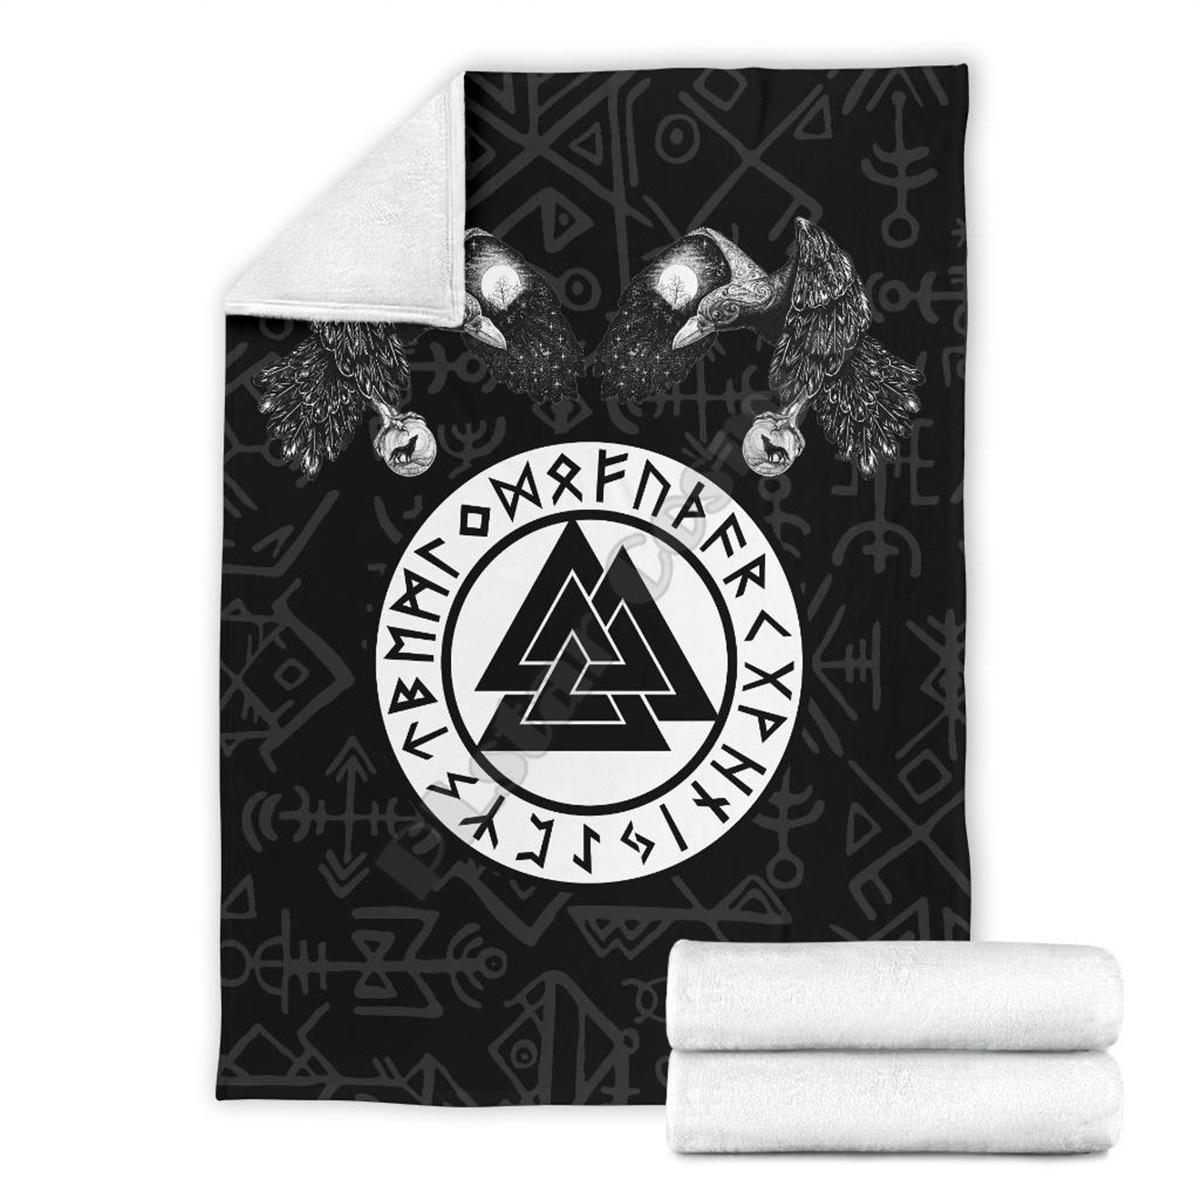 Viking tatuagem fenrir skoll e hati valknut raven 3d impresso cobertor sherpa na cama têxteis para casa dreamlike casa acessórios